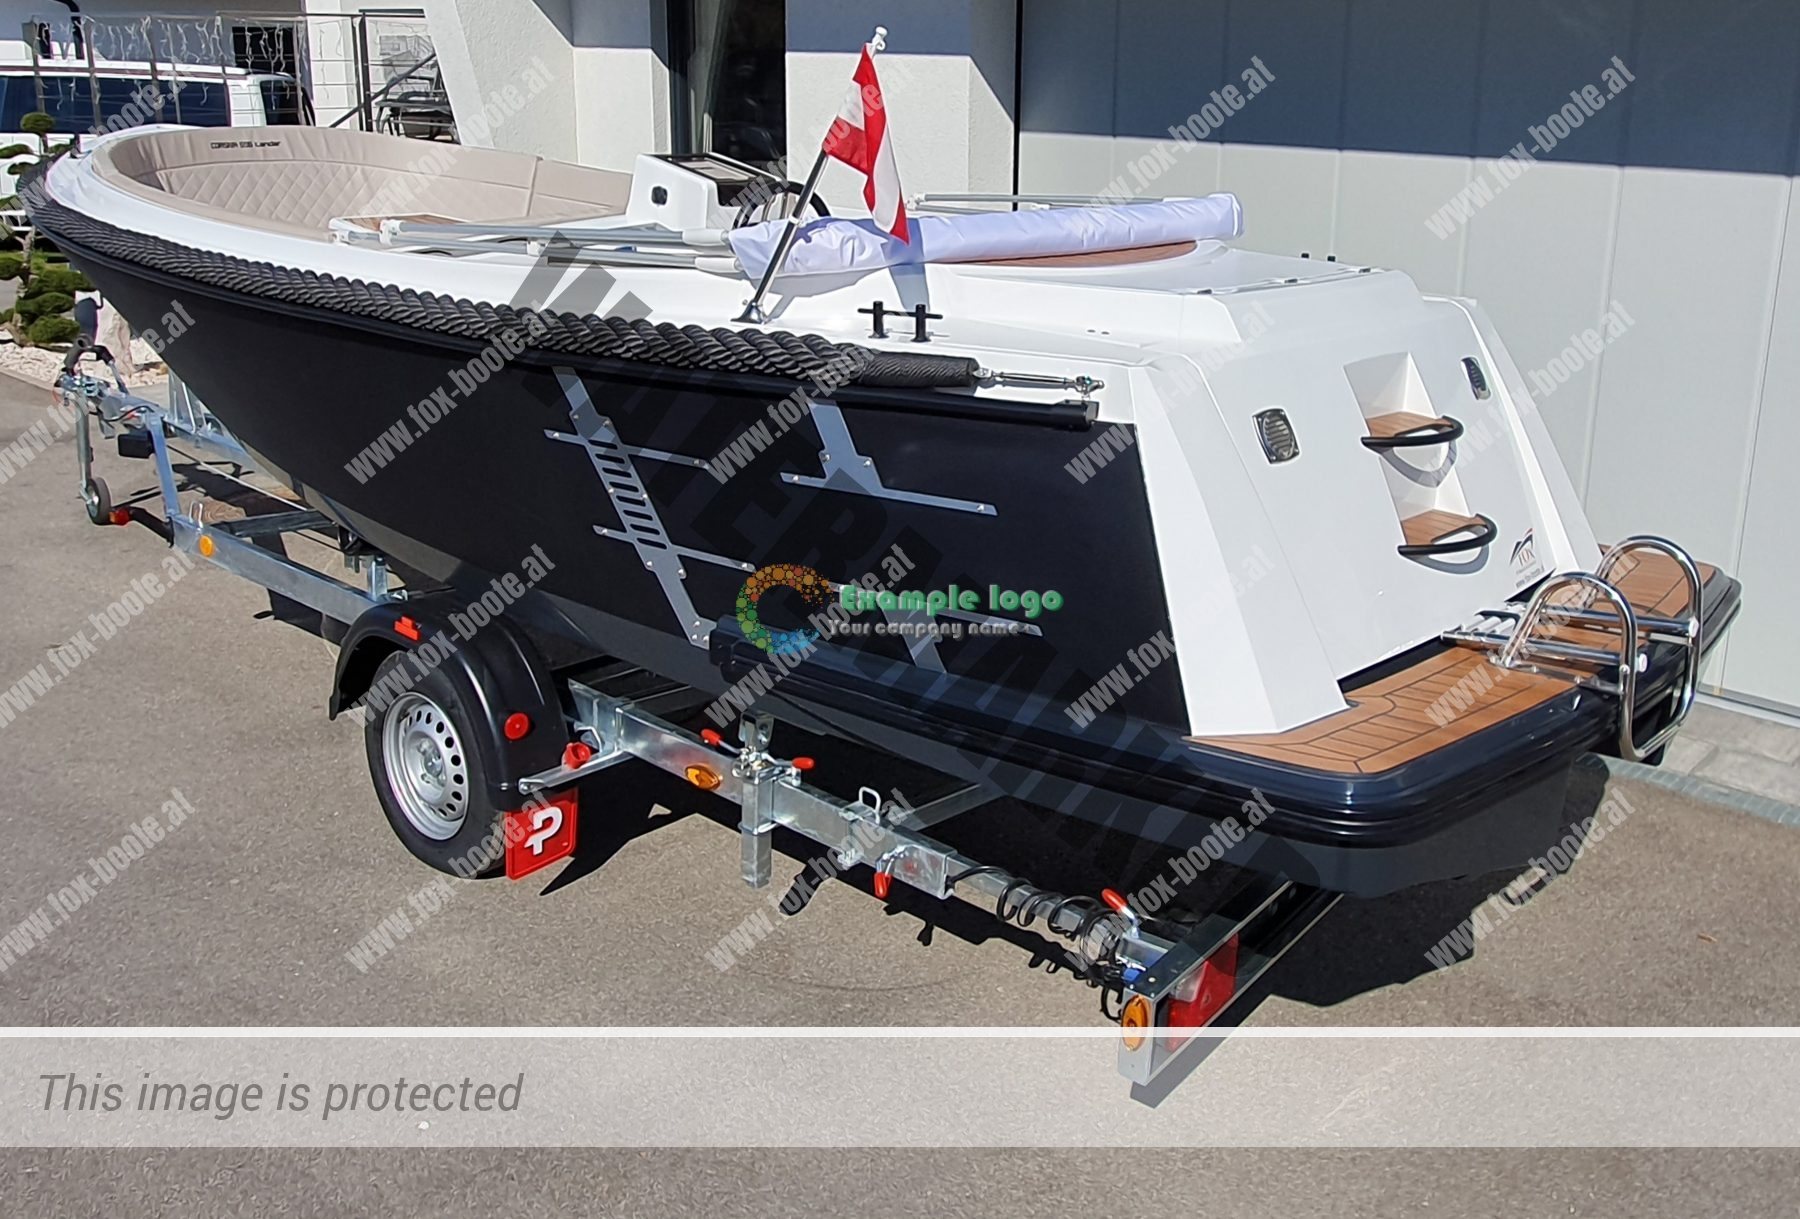 corsiva 595 tender 18